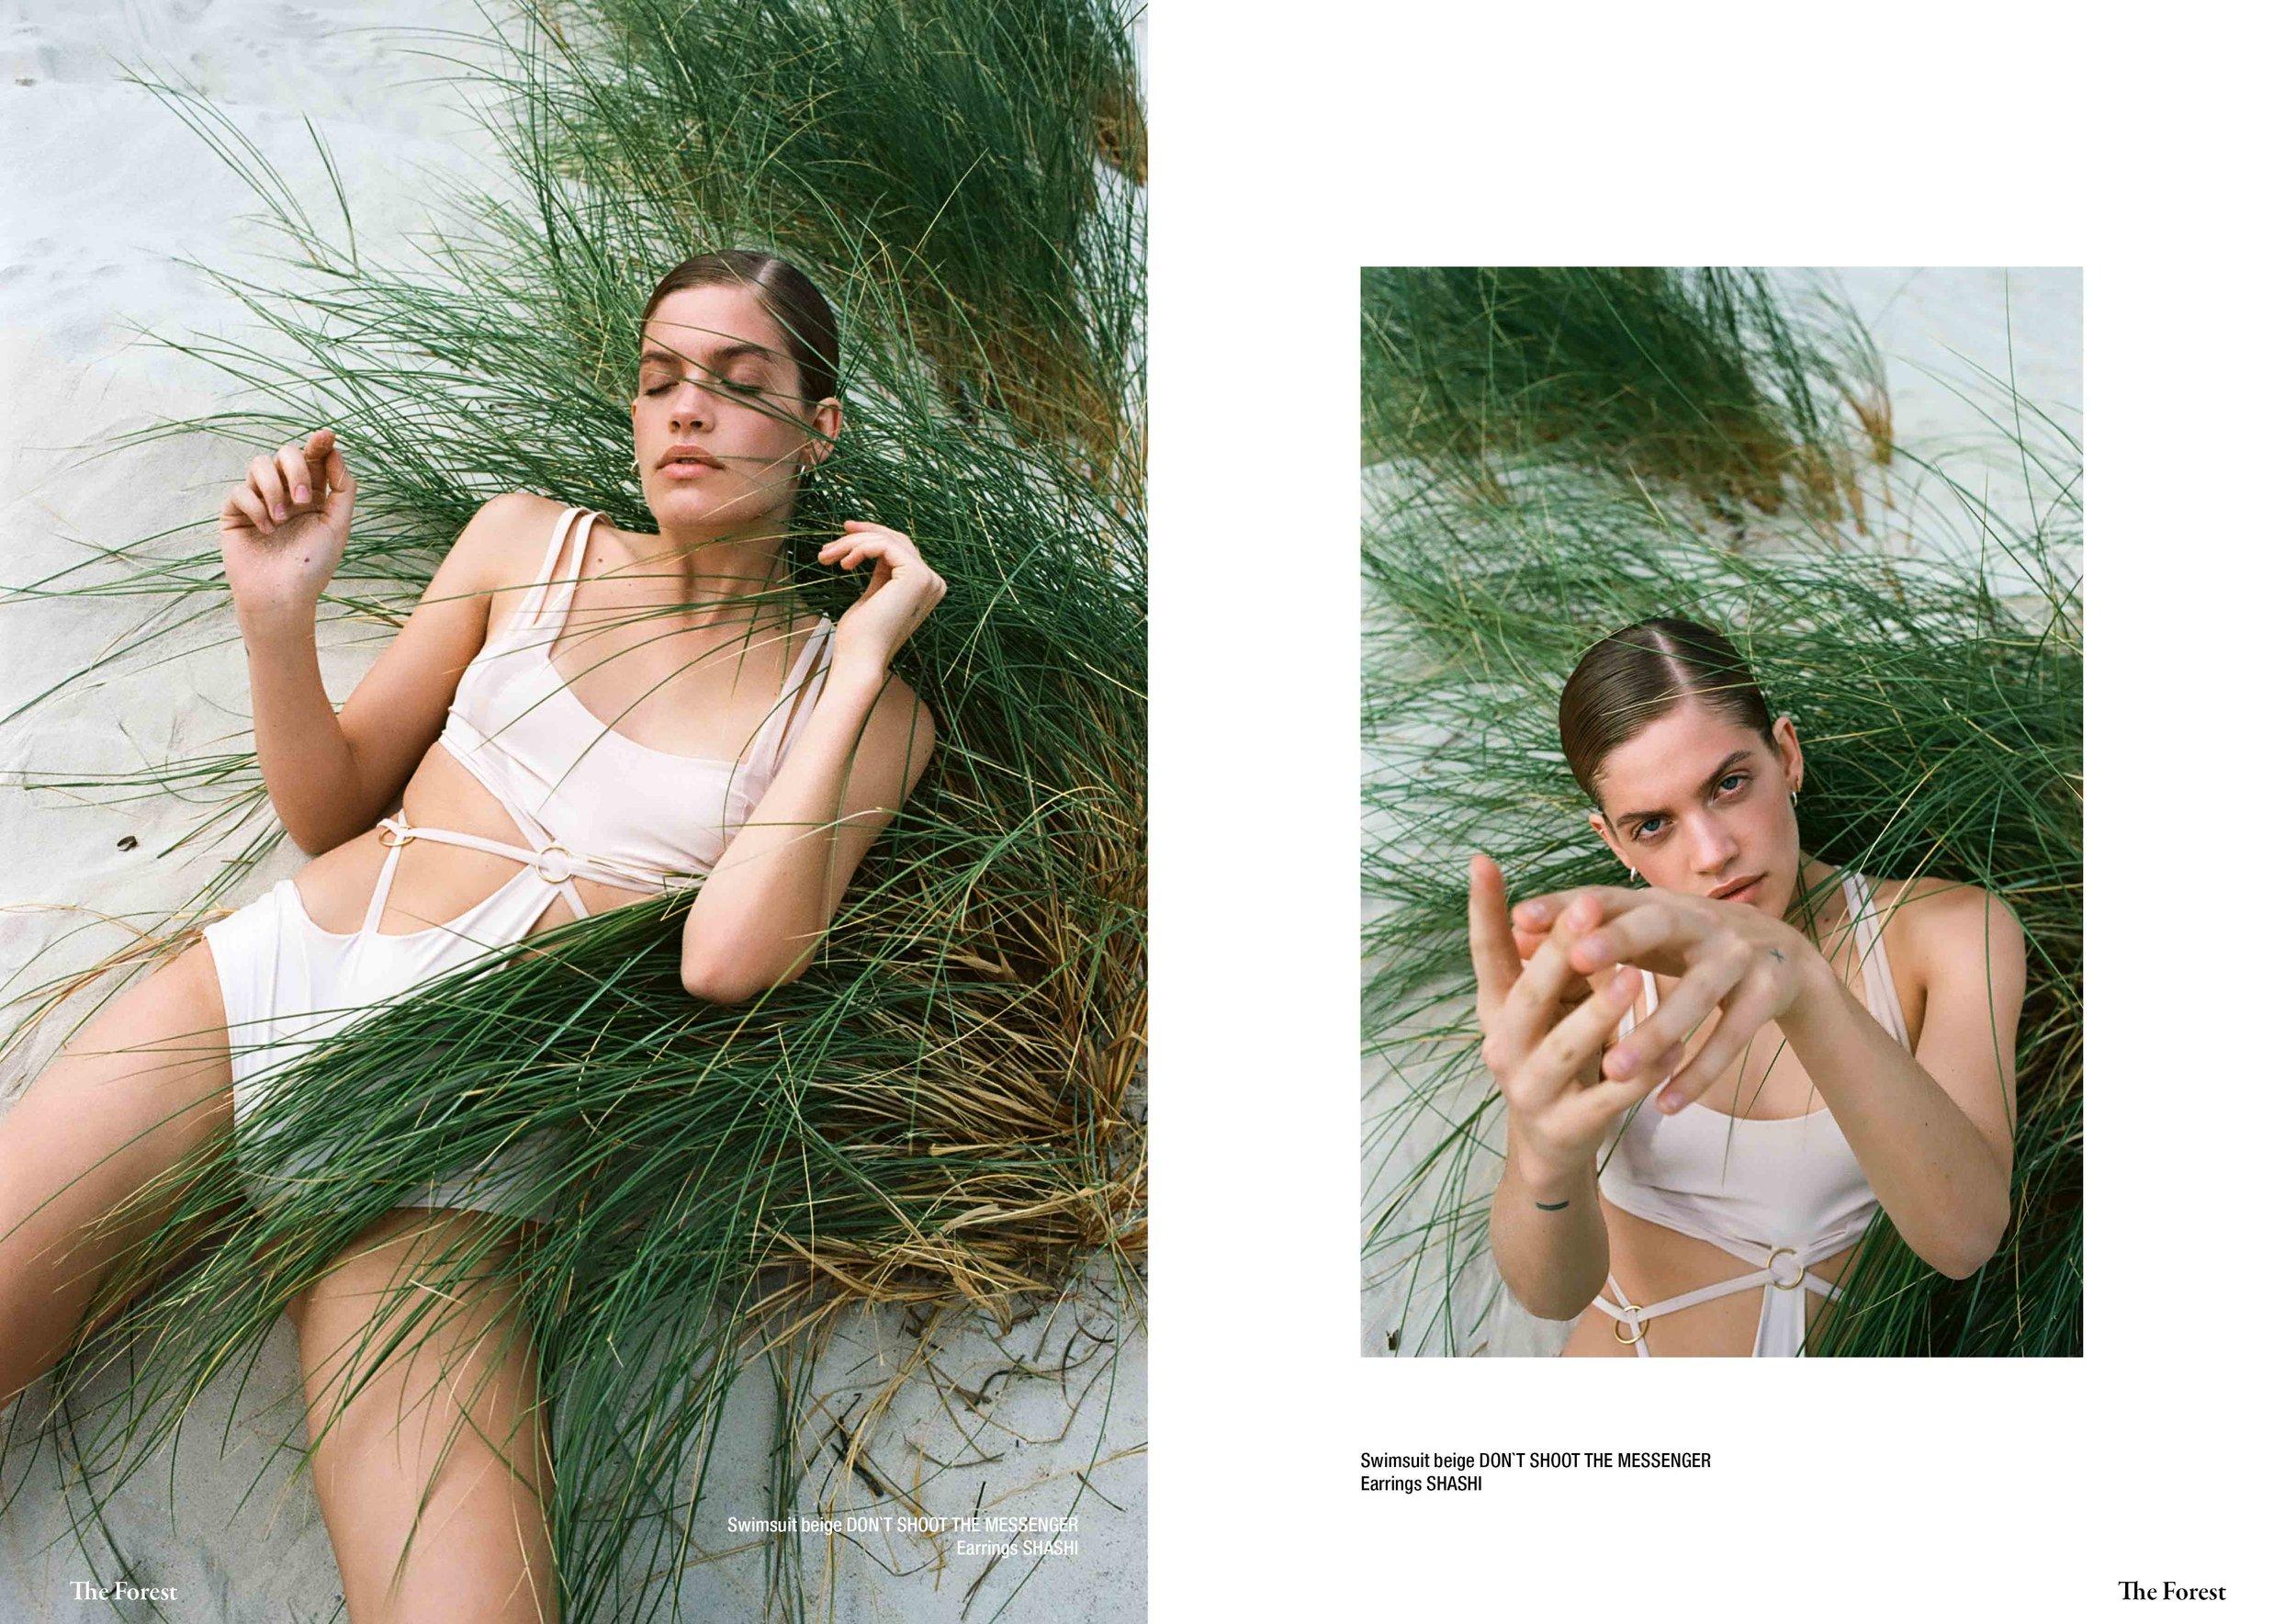 The_Forest_Detlef-Honigstein-Marolize-Southwood-Kimberly-Jane-Hunter-15.jpg